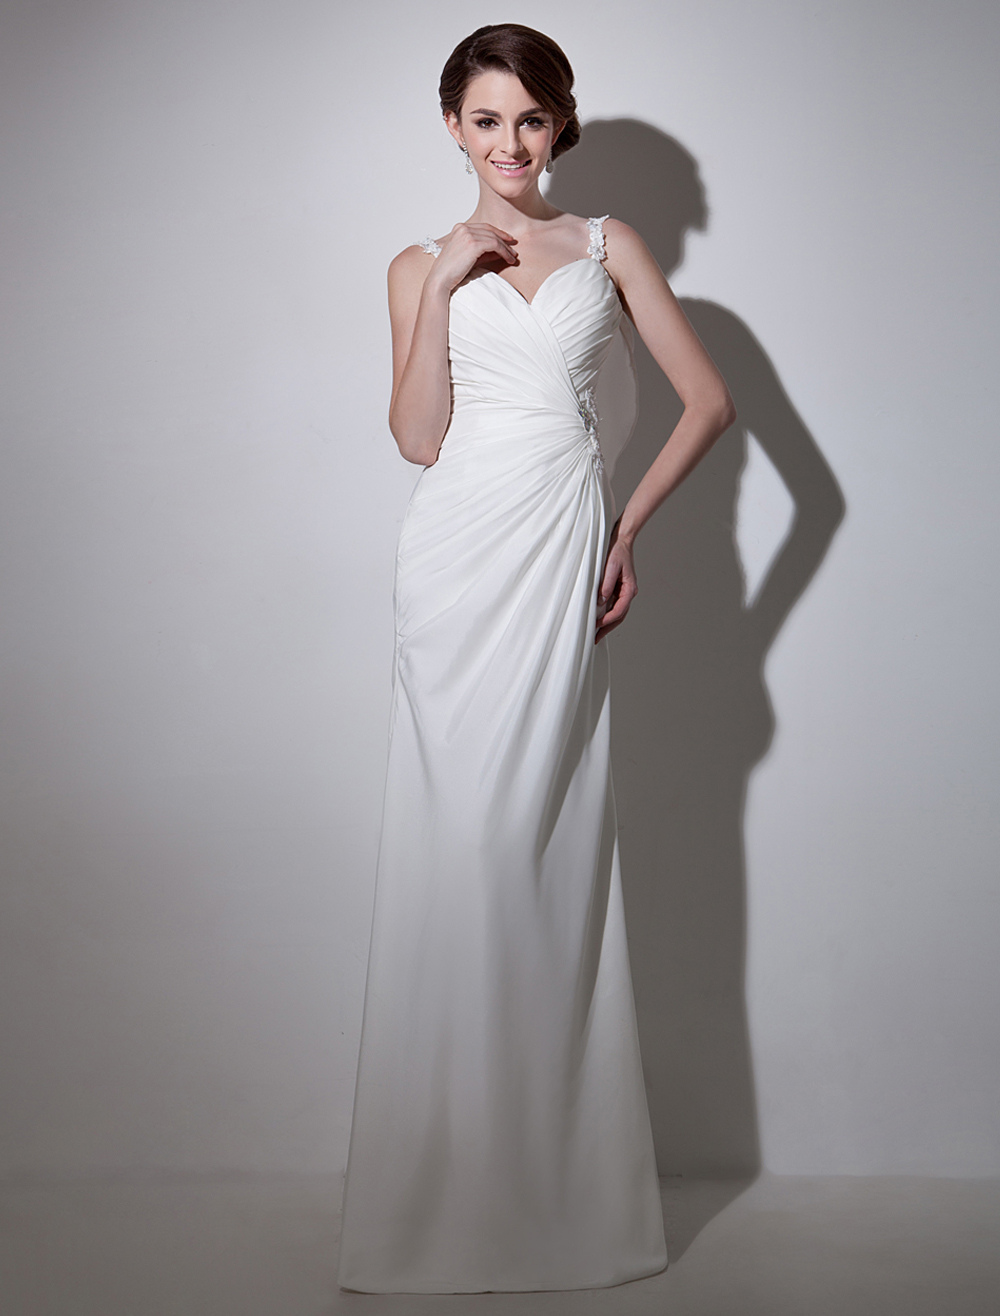 White Lace Great Bridal Wedding Dress Milanoo